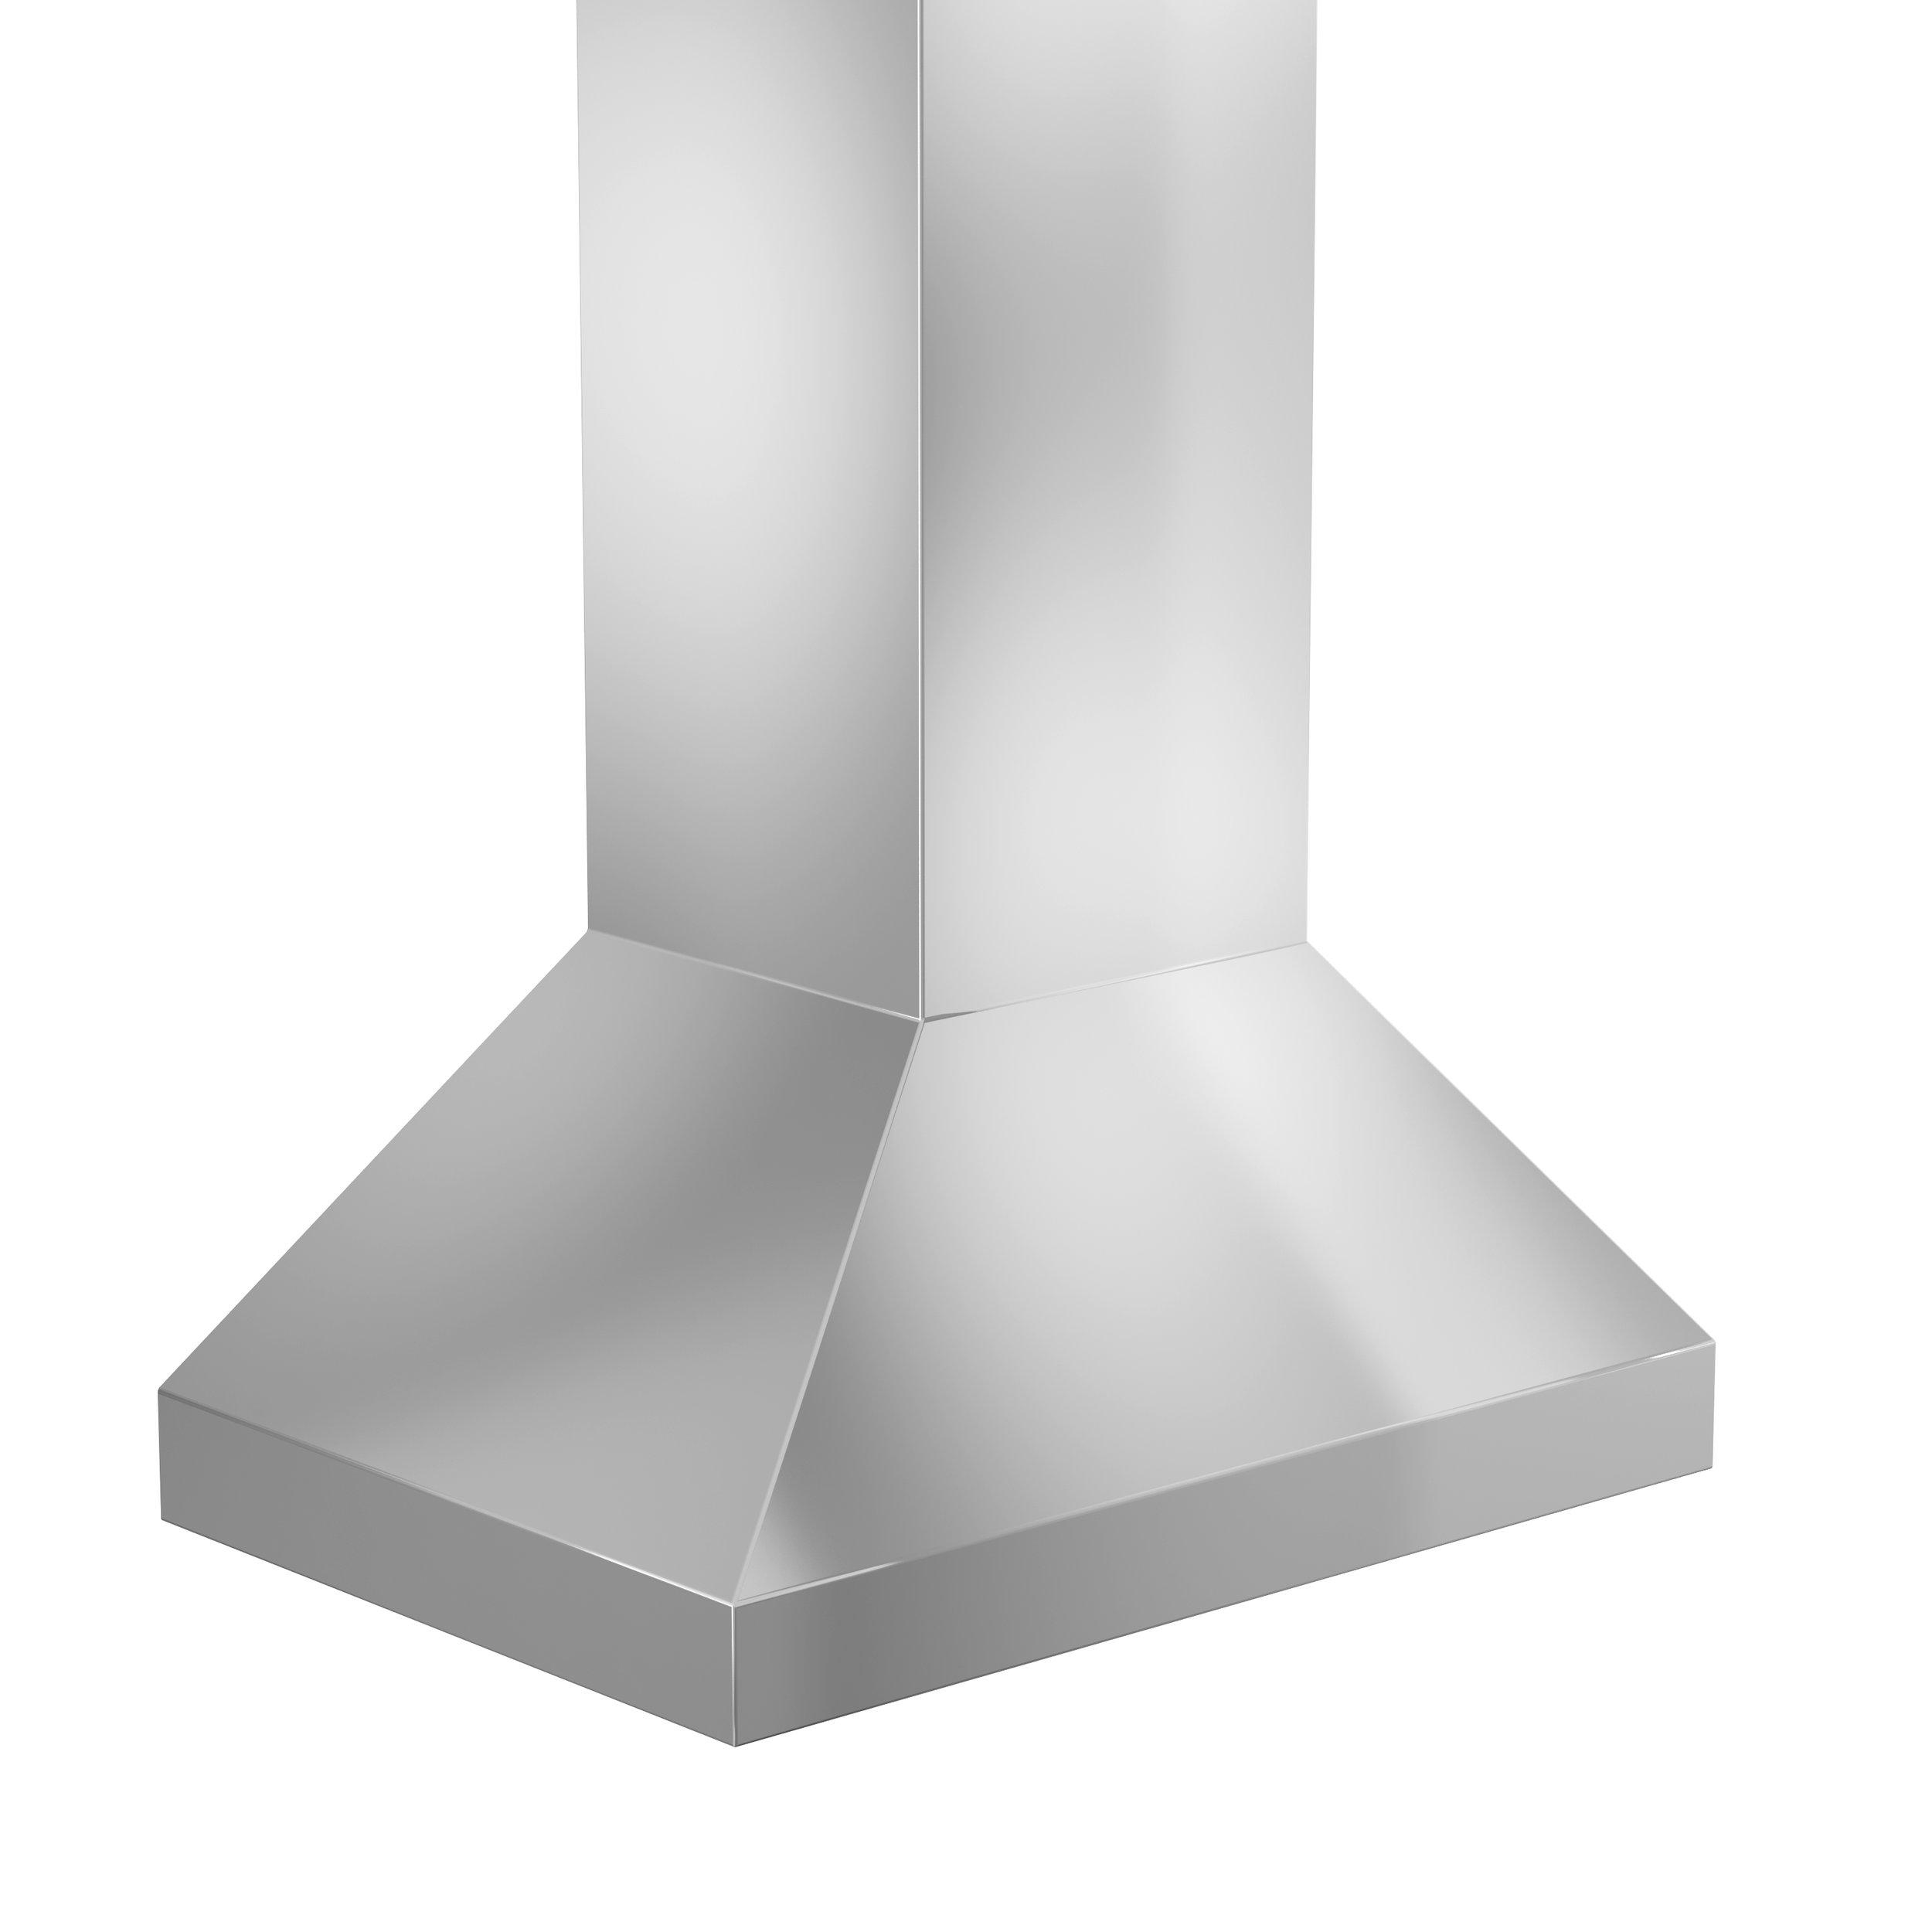 zline-stainless-steel-island-range-hood-597i-top.jpg